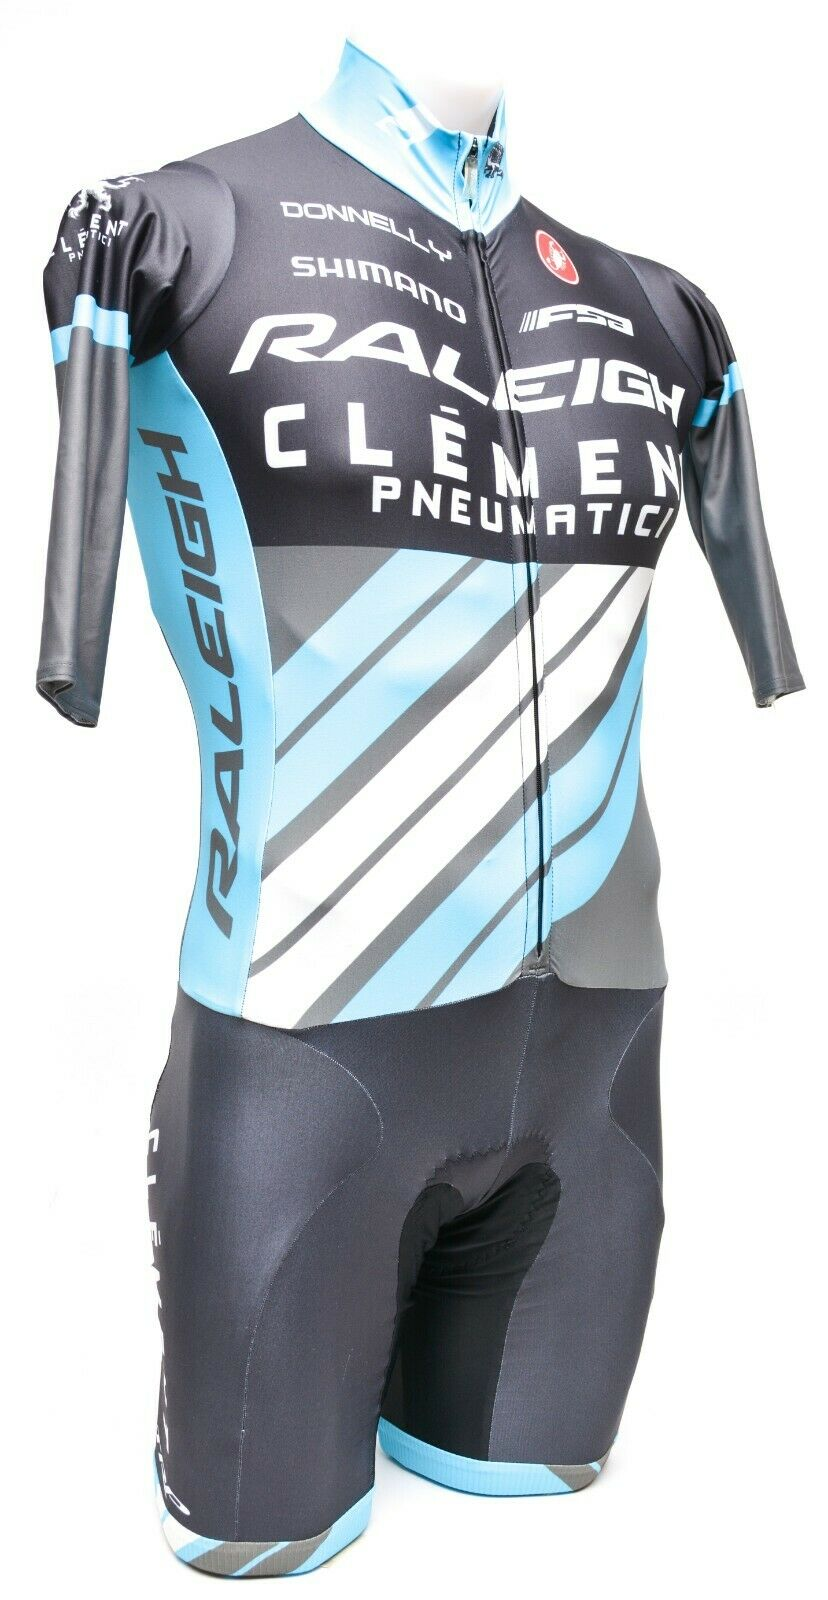 Castelli 34 Sleeve Skinsuit XS Raleigh Clement FSA Road Bike MTB Cyclocross